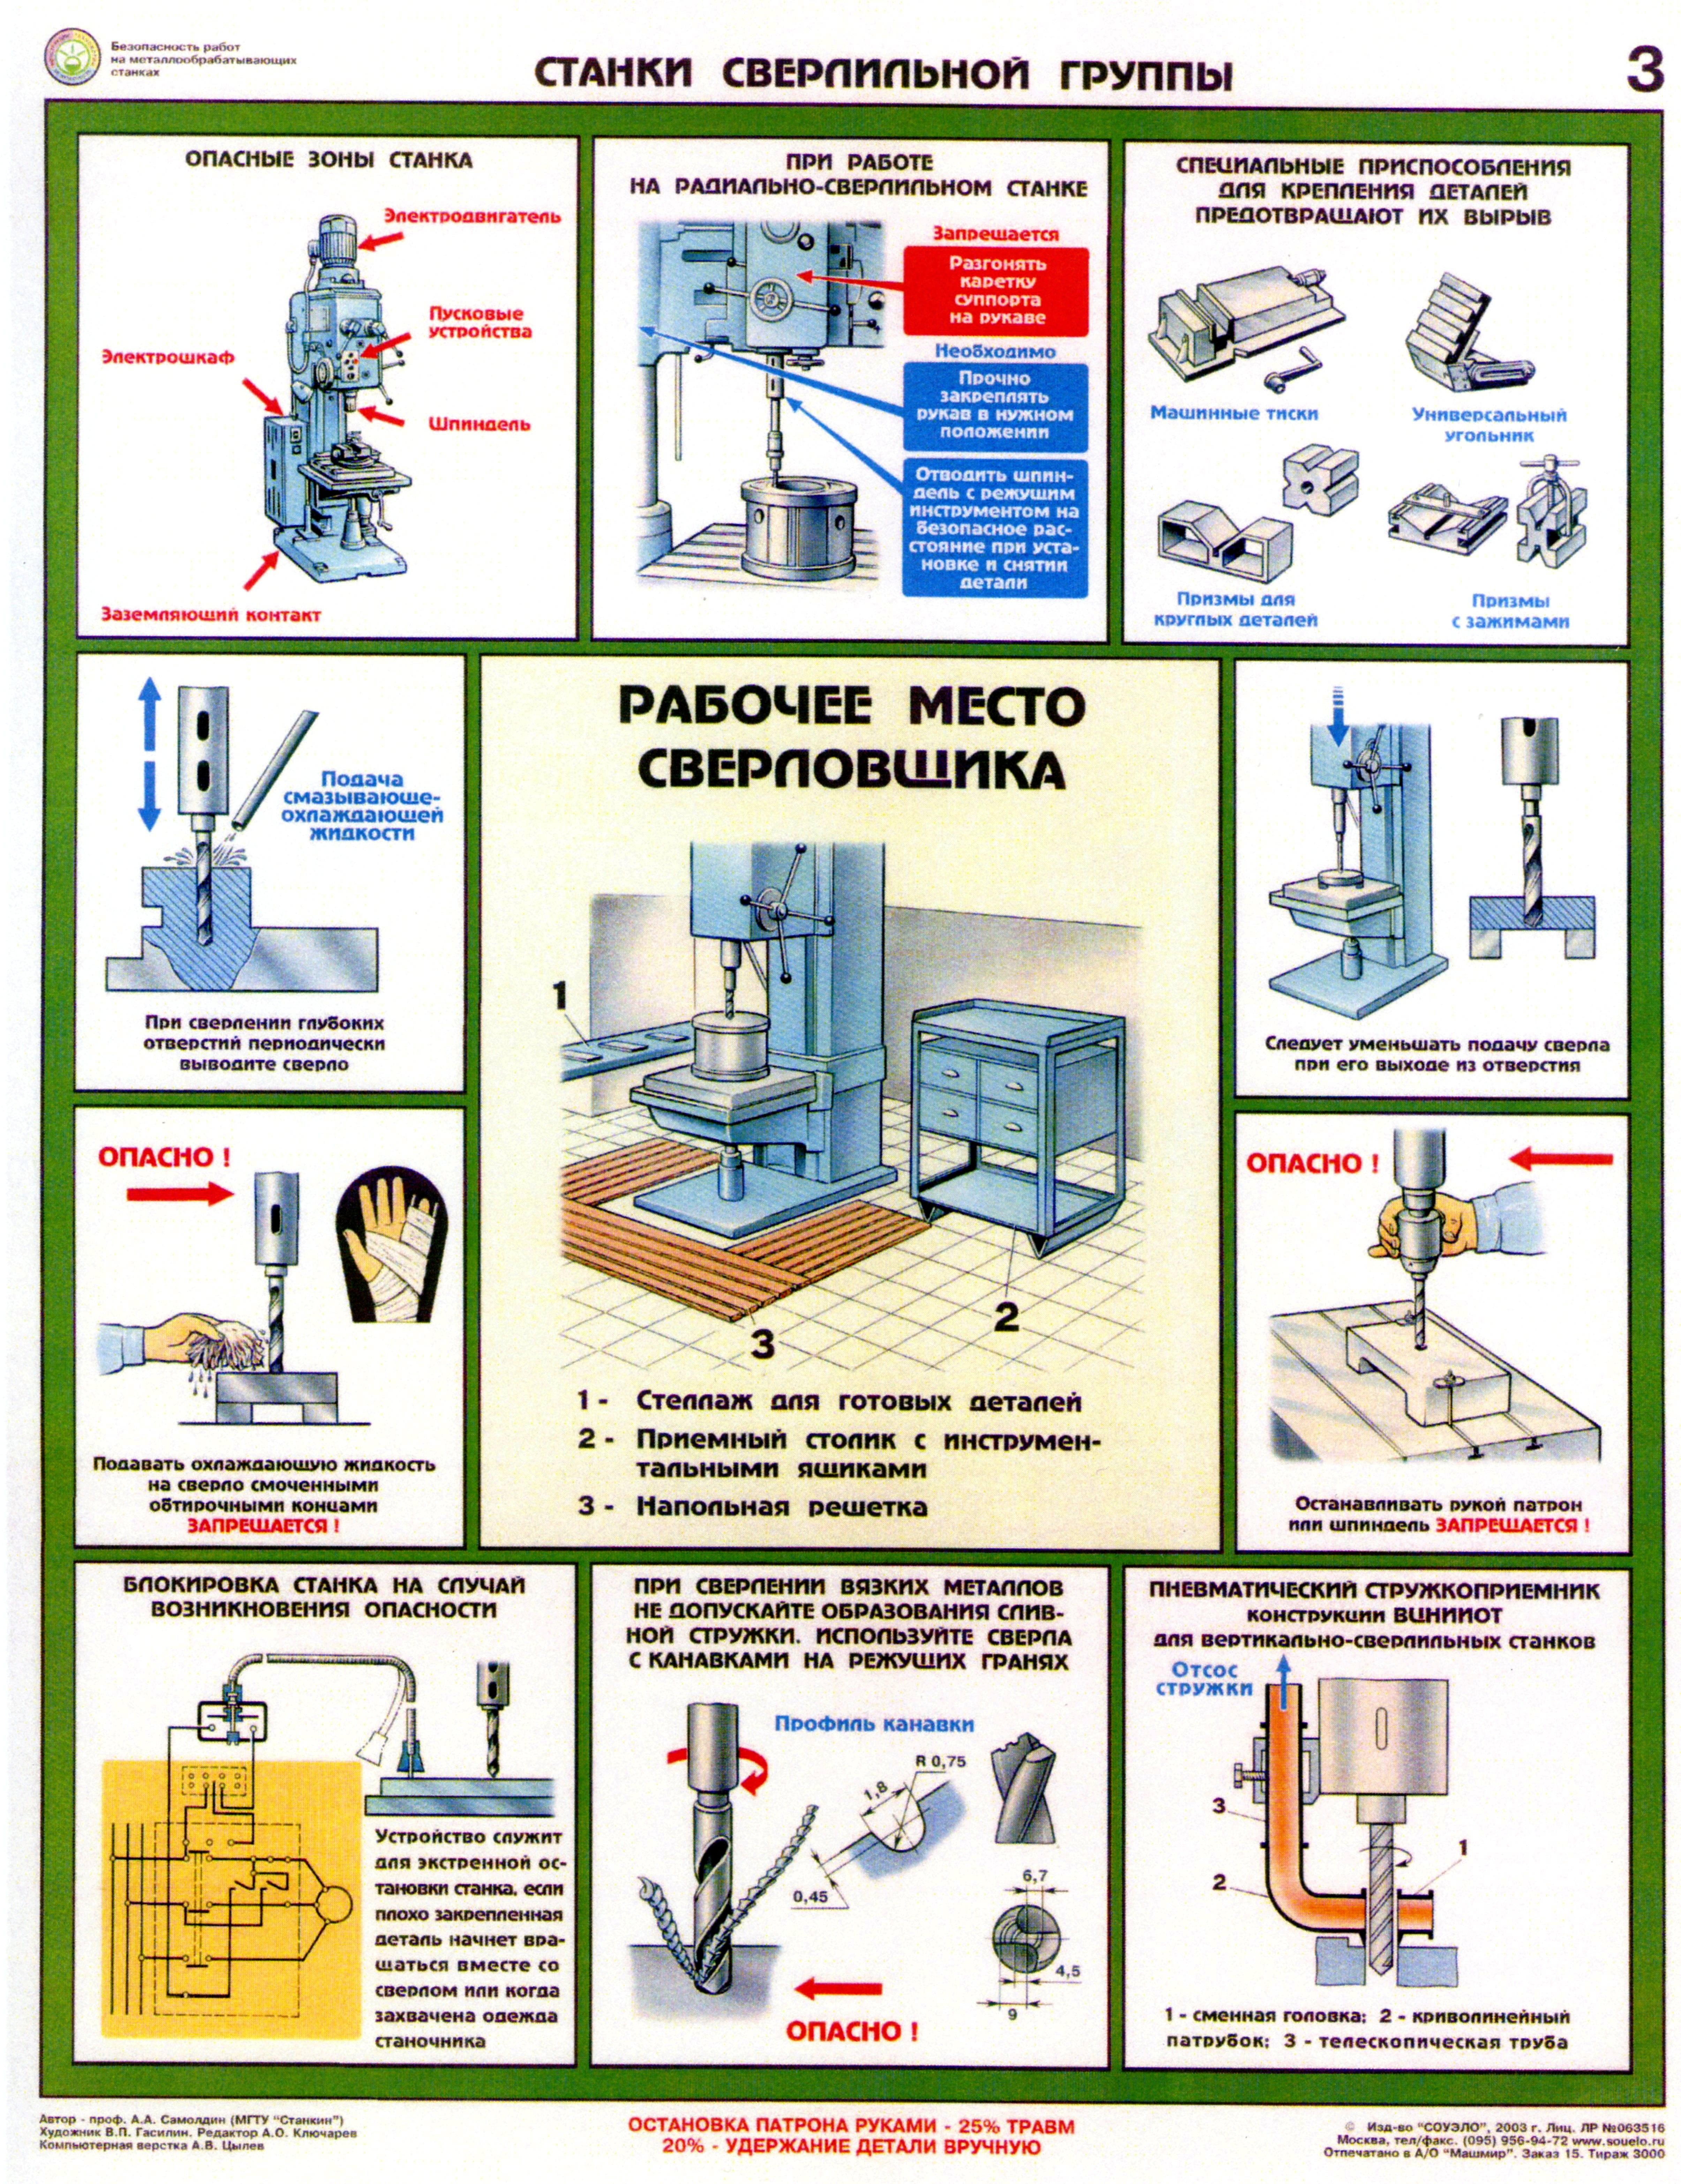 инструкция по от для плотника